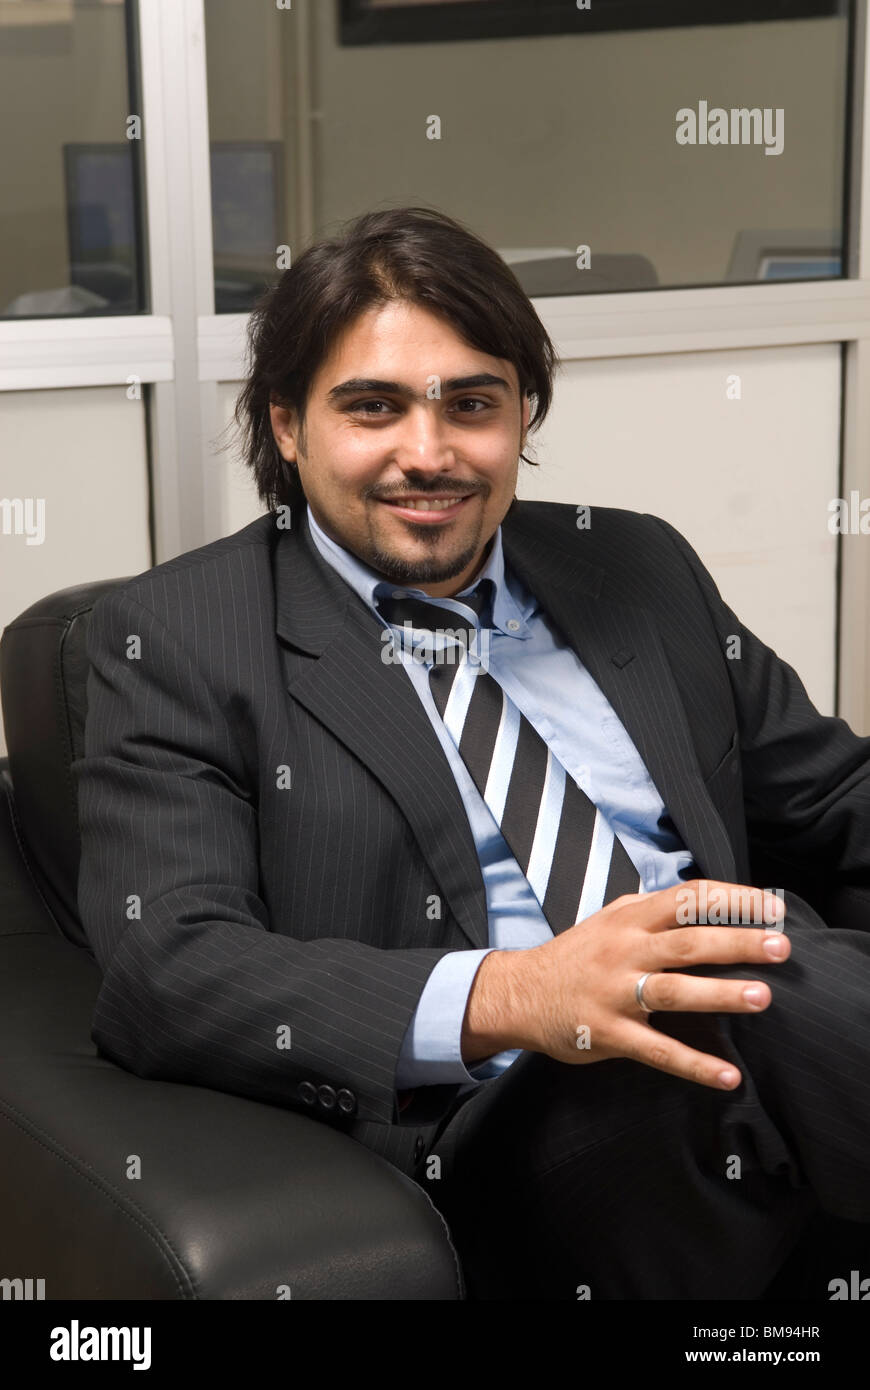 Lächelnde Geschäftsmann saß im Büro lächelnd Beirut-Libanon-Nahost Stockbild